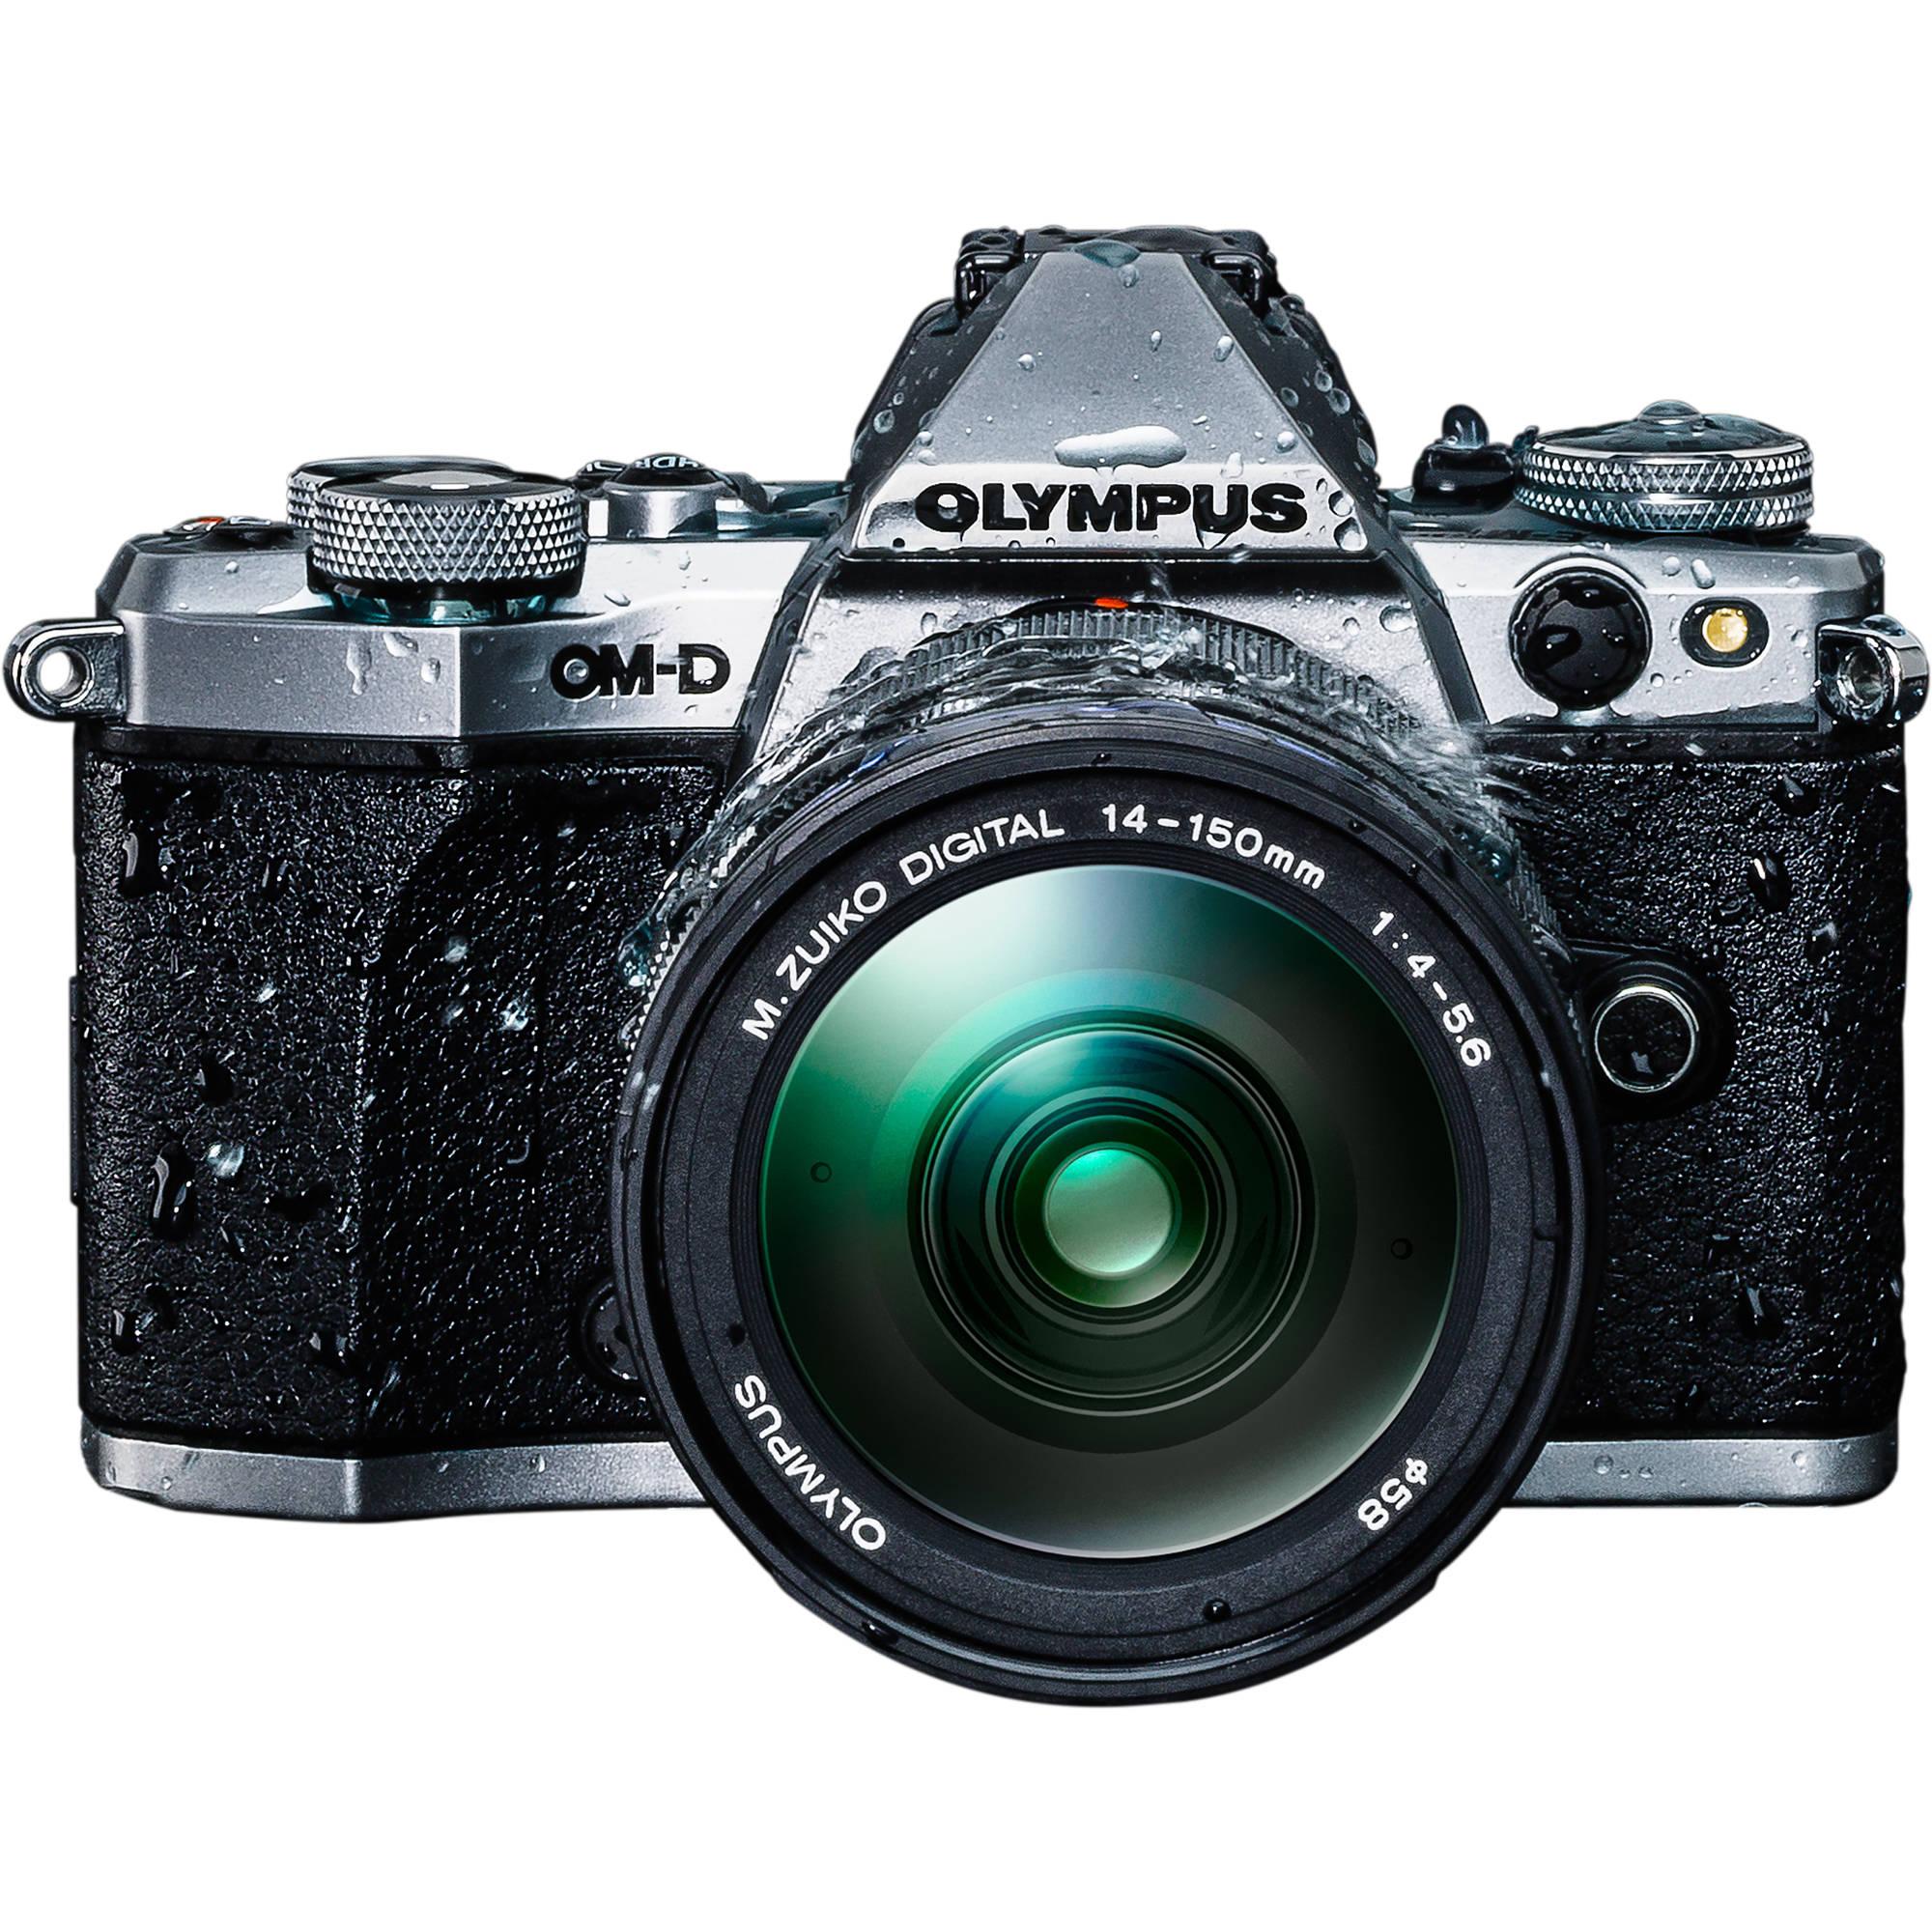 Olympus Om D E M5 Mark Ii Mirrorless Micro Four V207040su010 Bh Kit Ed 12 40mm F 28 Pro Thirds Digital Camera With